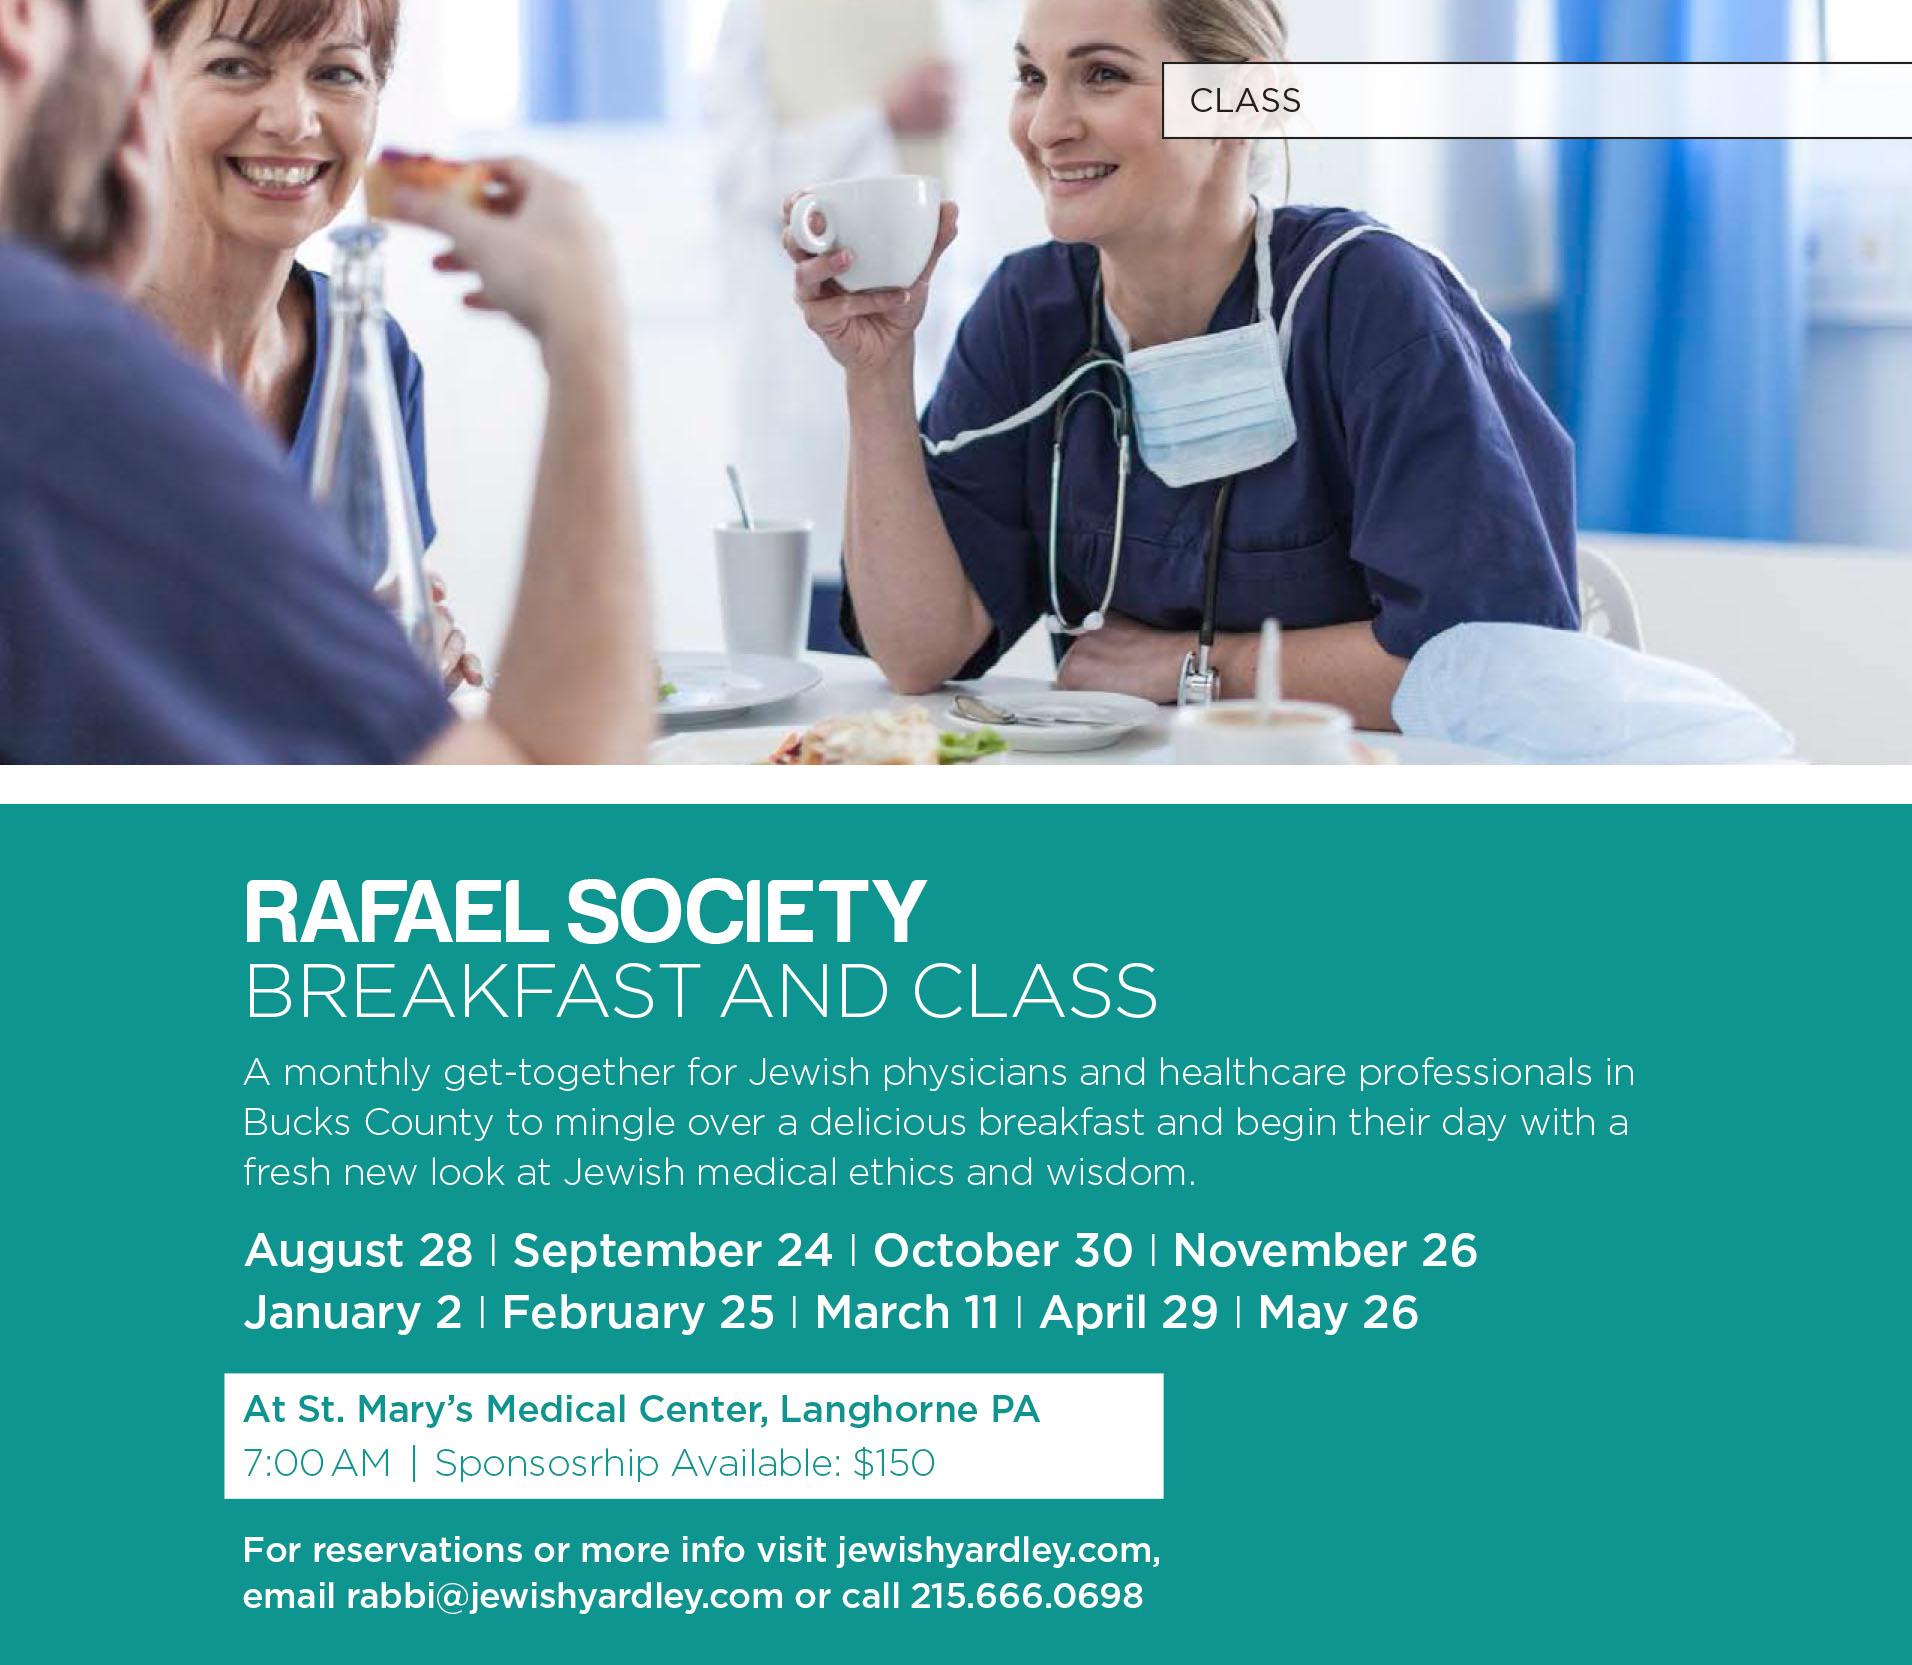 Rafael Society: Breakfast and Class